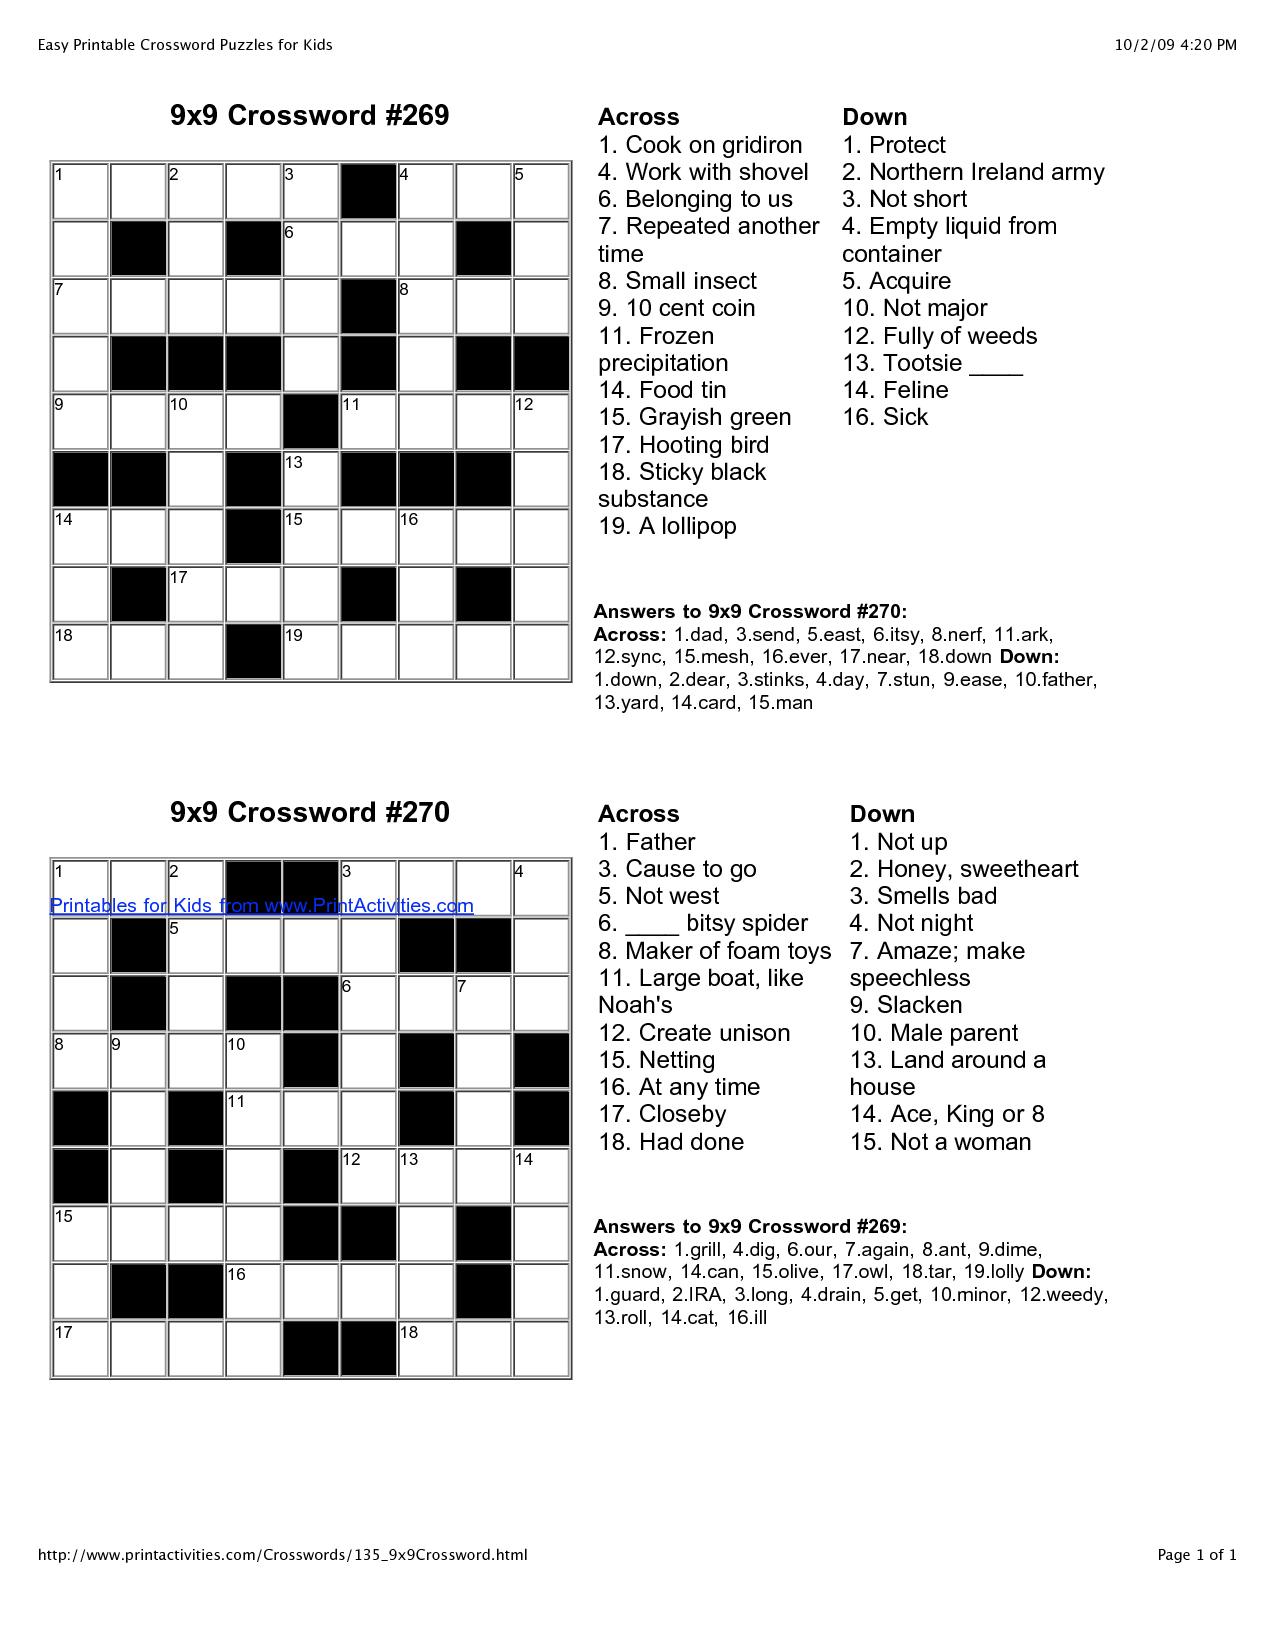 Crossword Puzzle Maker Game Crosswords Free Easy Printable Puzzles - Free Printable Variety Puzzles